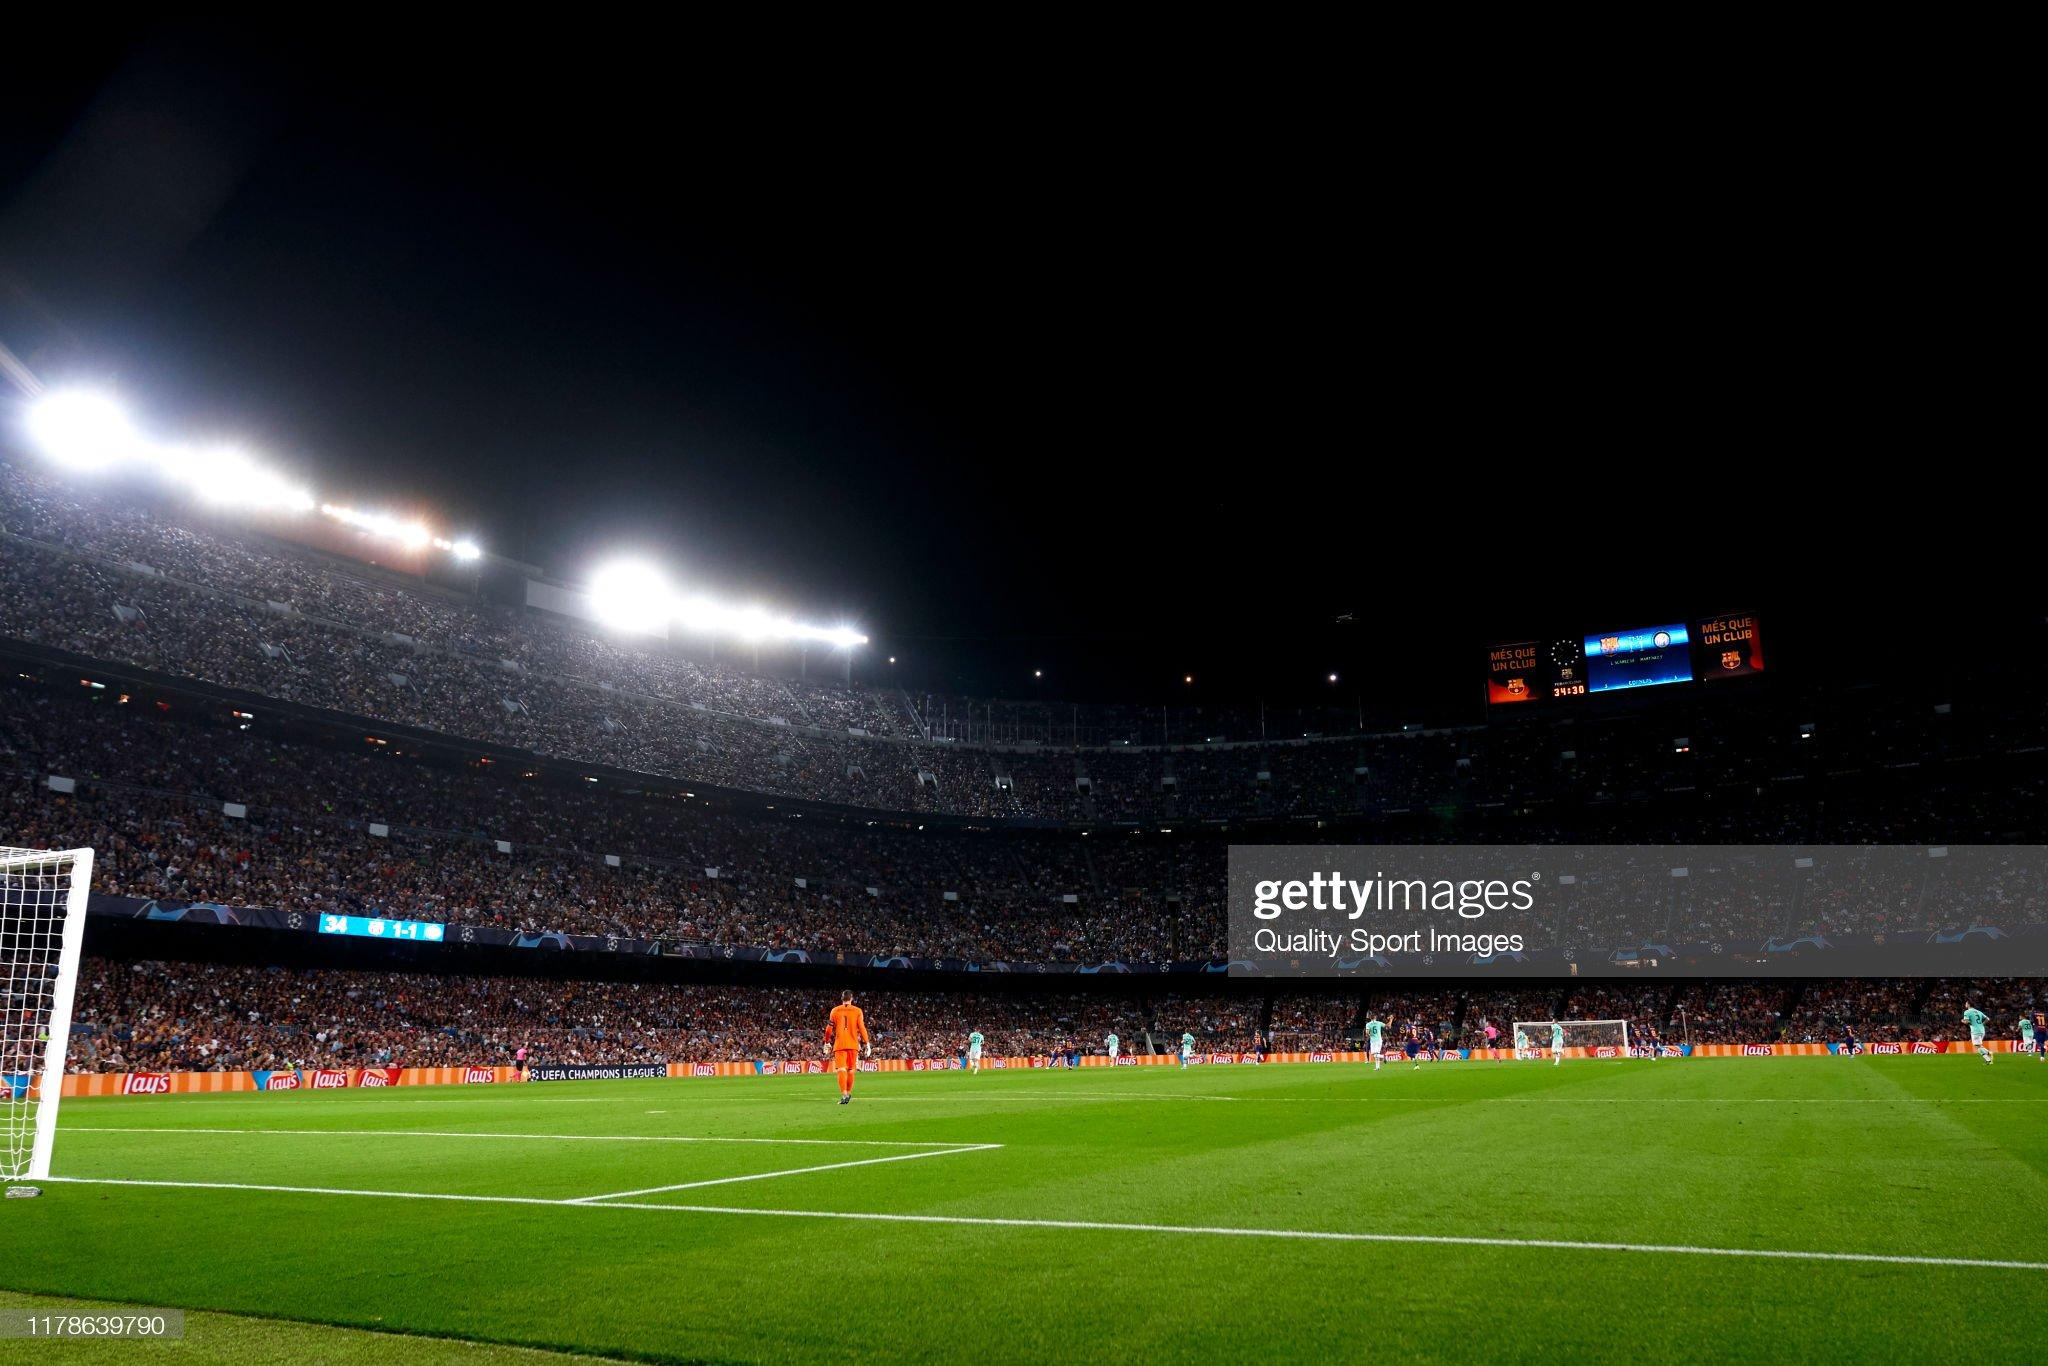 صور مباراة : برشلونة - إنتر 2-1 ( 02-10-2019 )  General-view-of-camp-nou-stadium-during-the-uefa-champions-league-f-picture-id1178639790?s=2048x2048